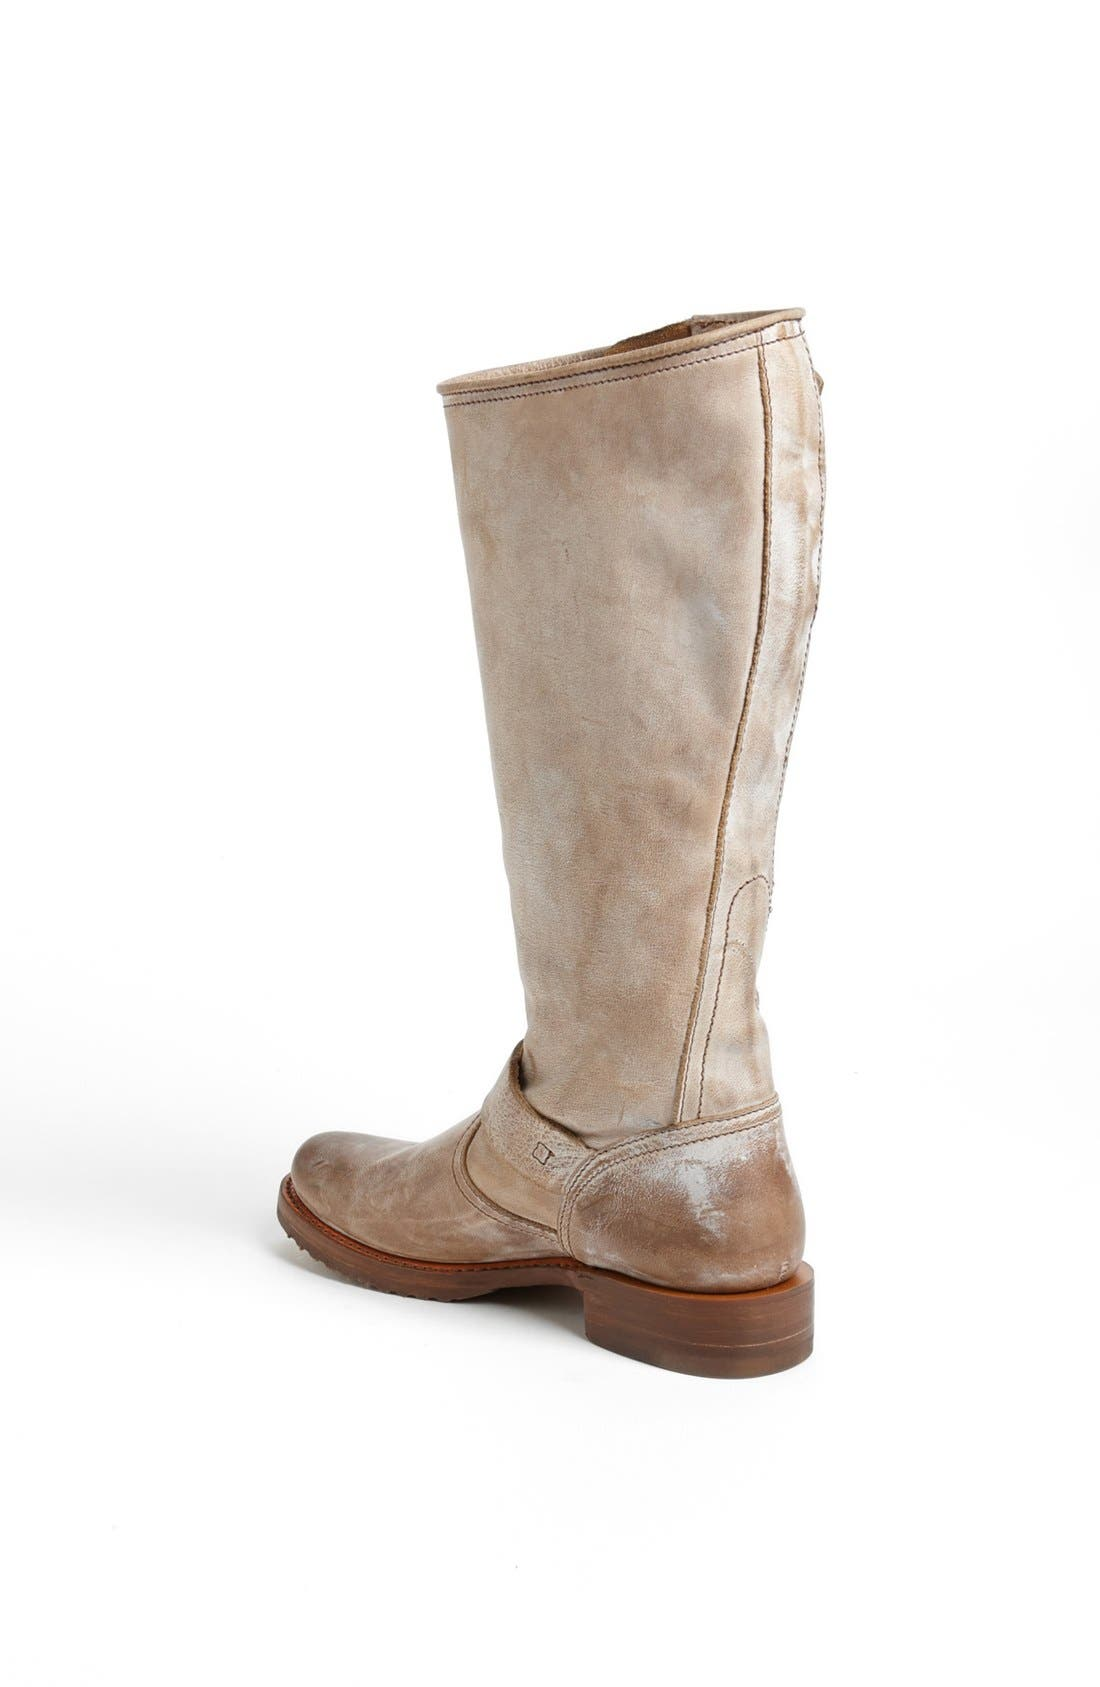 Alternate Image 2  - Frye 'Veronica Slouch' Boot (Regular & Wide Calf) (Women)